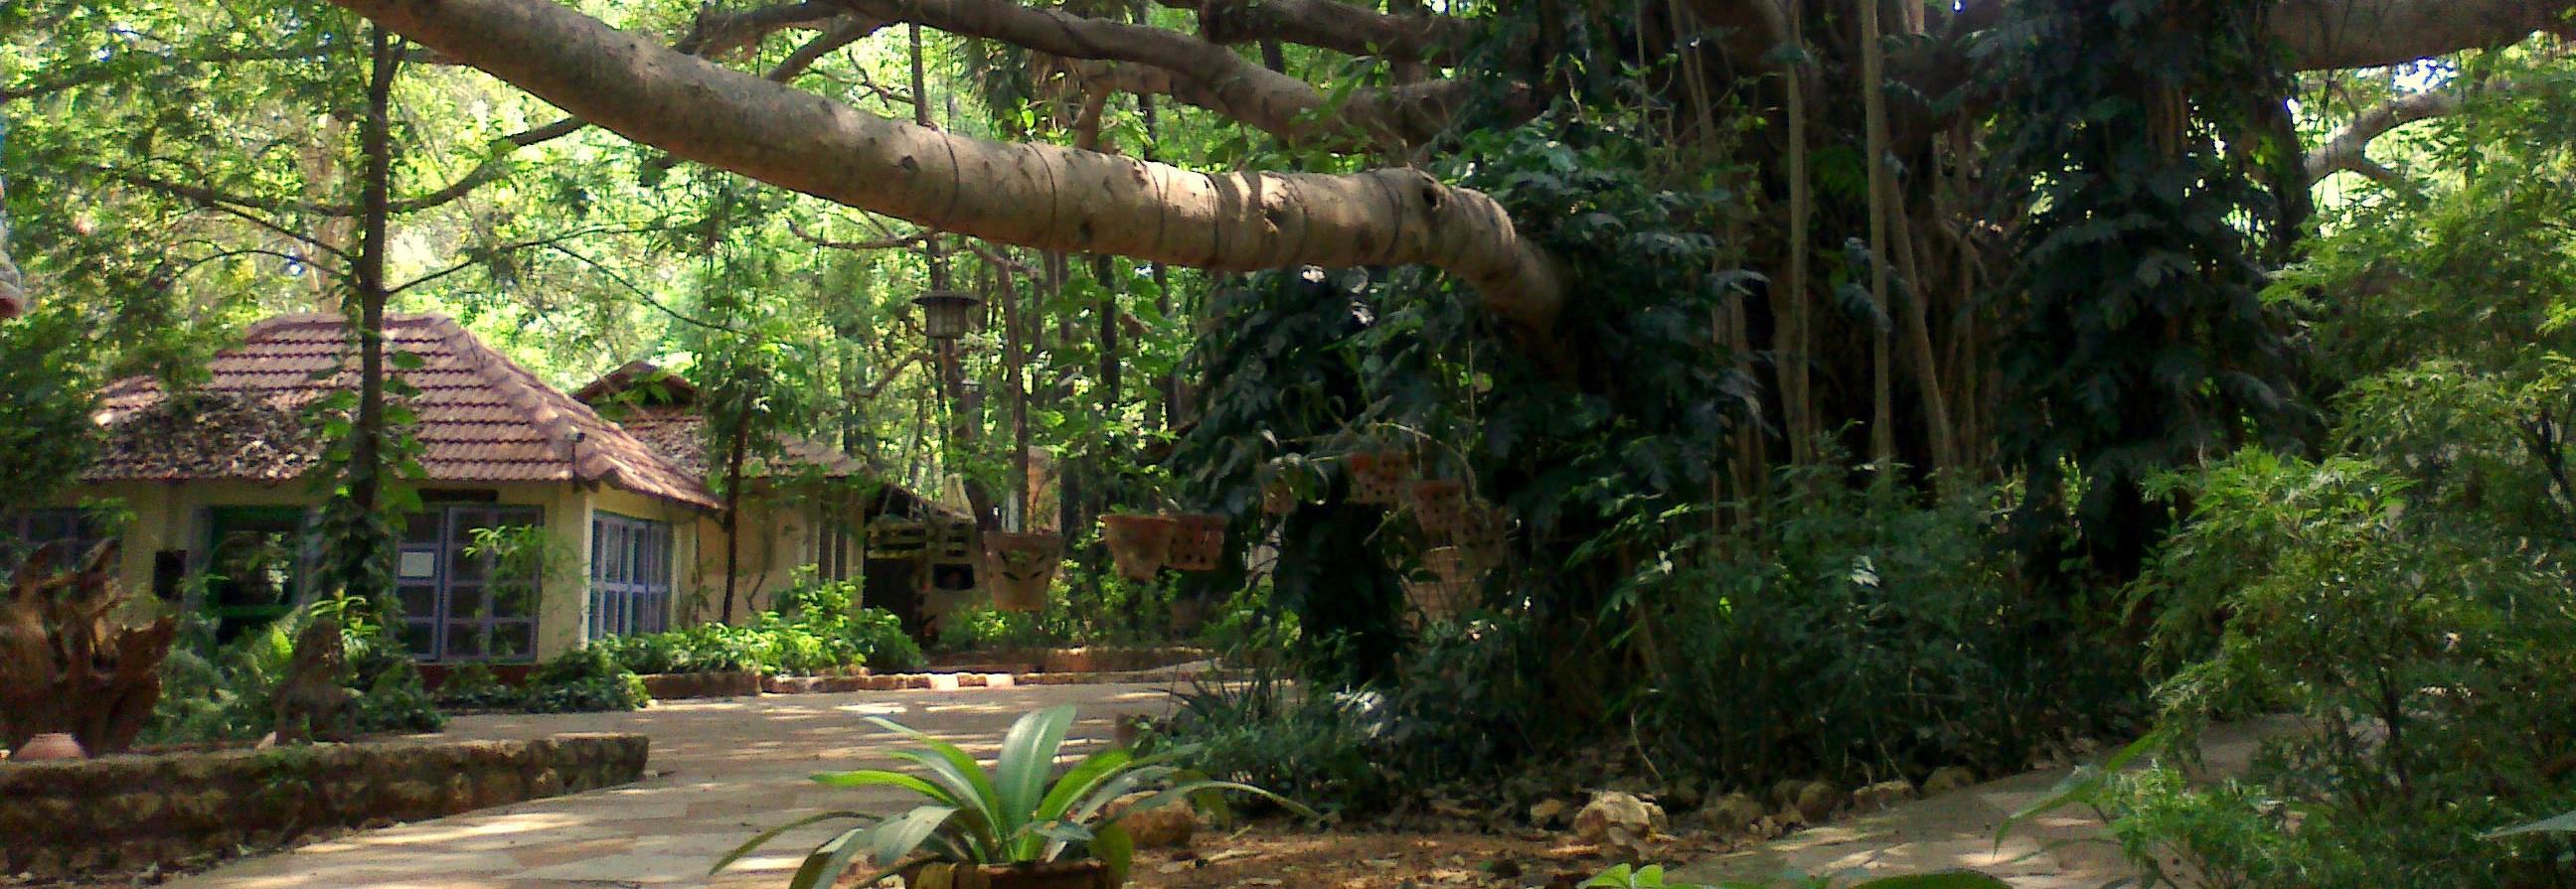 Auroville e Norte da Índia